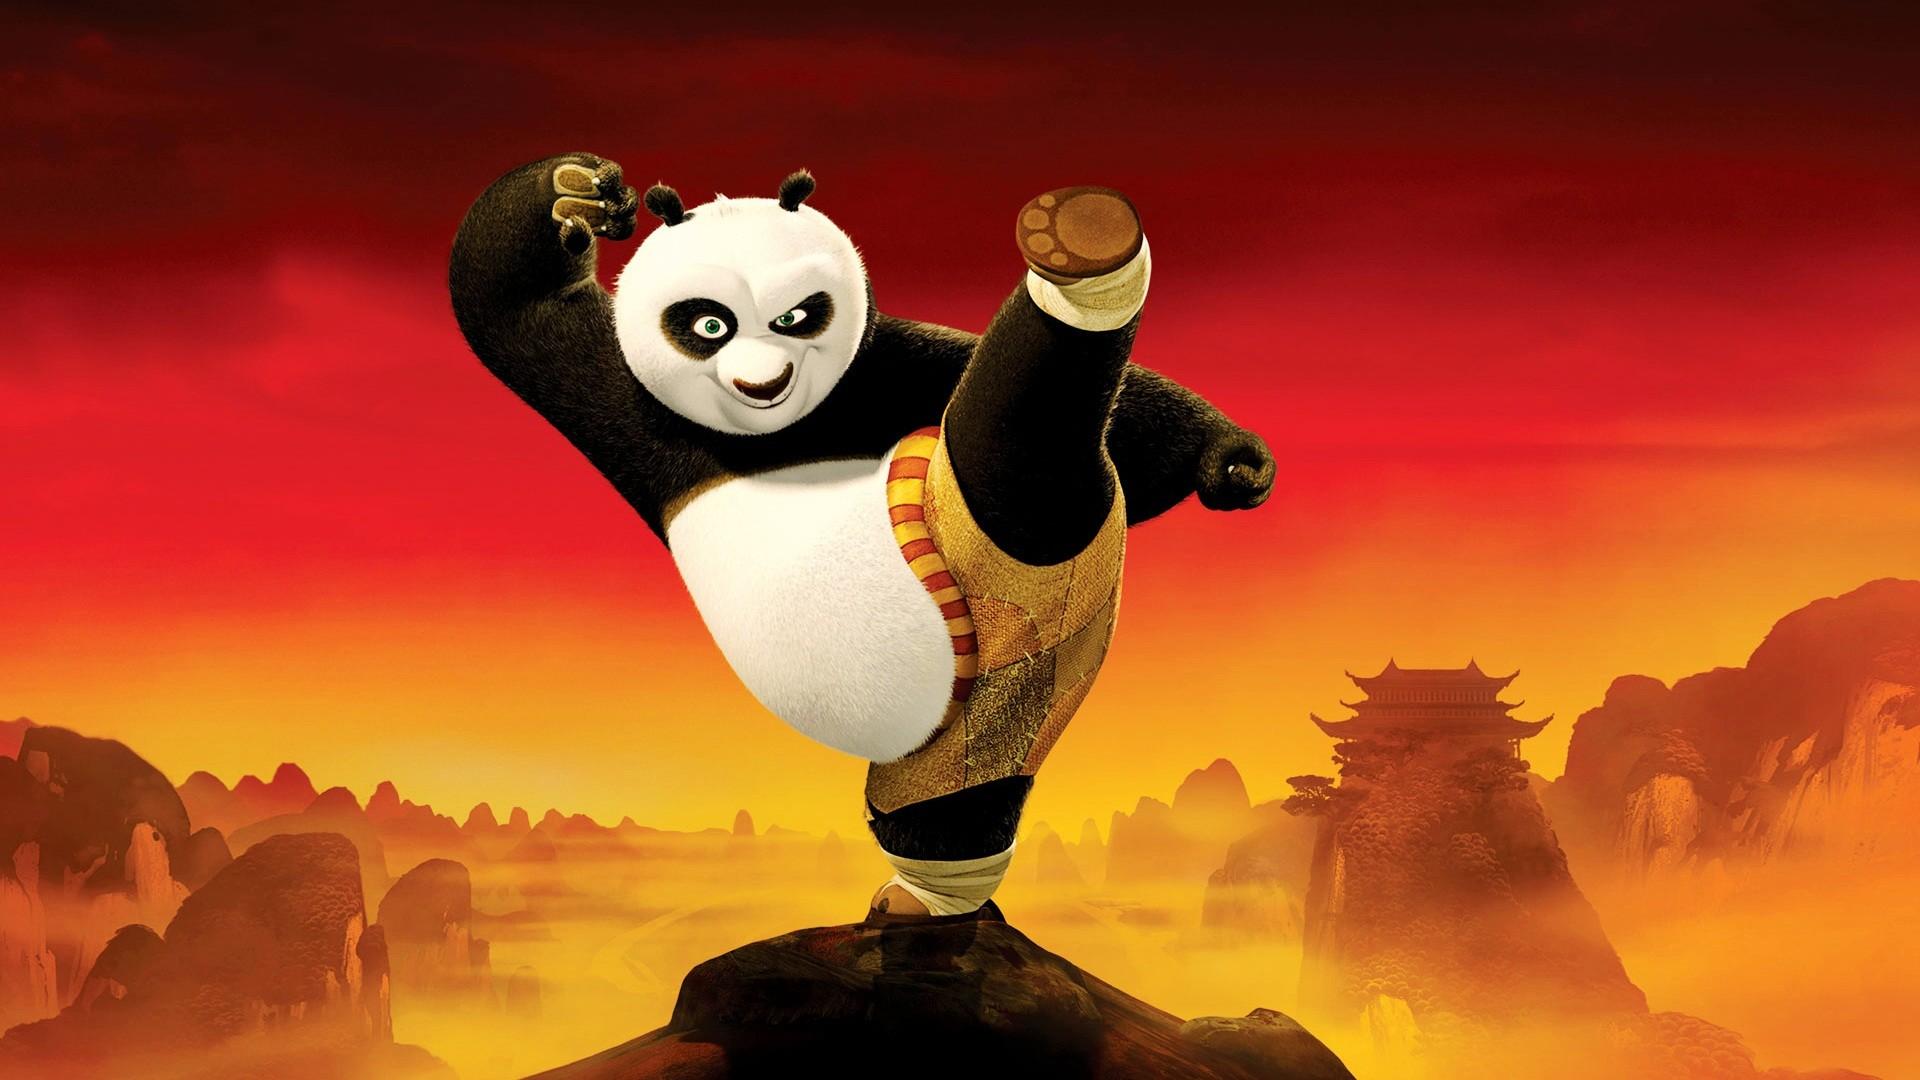 cartoon wallpapers hd kung fu panda d Cool Wallpaper HD | HD Wallpapers |  Pinterest | Cartoon wallpaper, Hd wallpaper and Cartoon